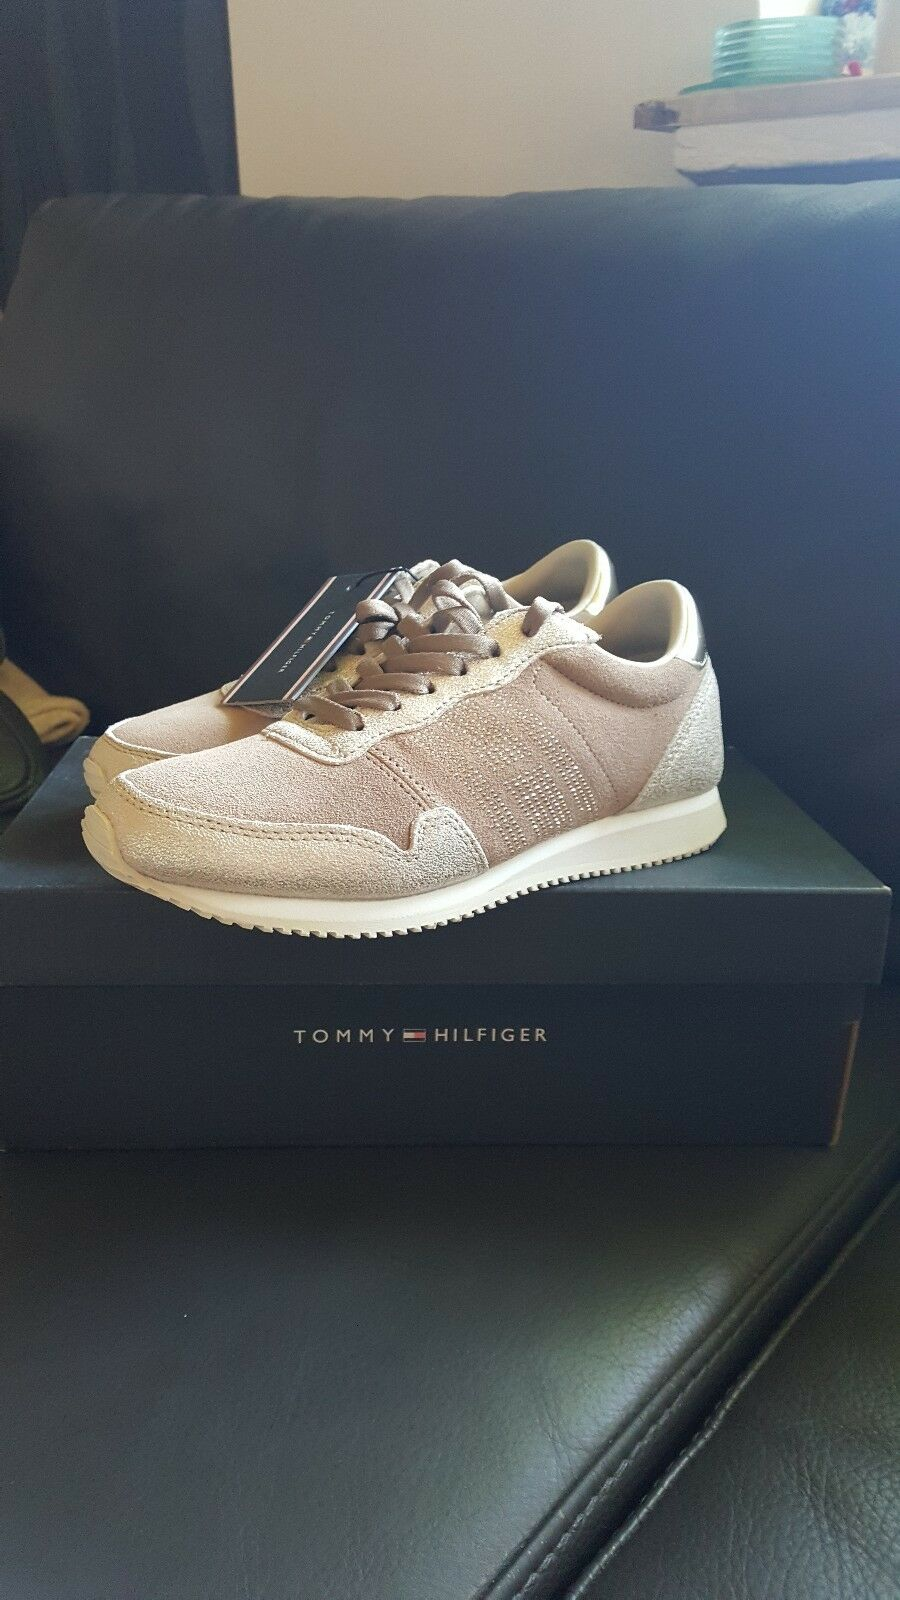 NEU Tommy Hilfiger Sneaker Gr 36 gold